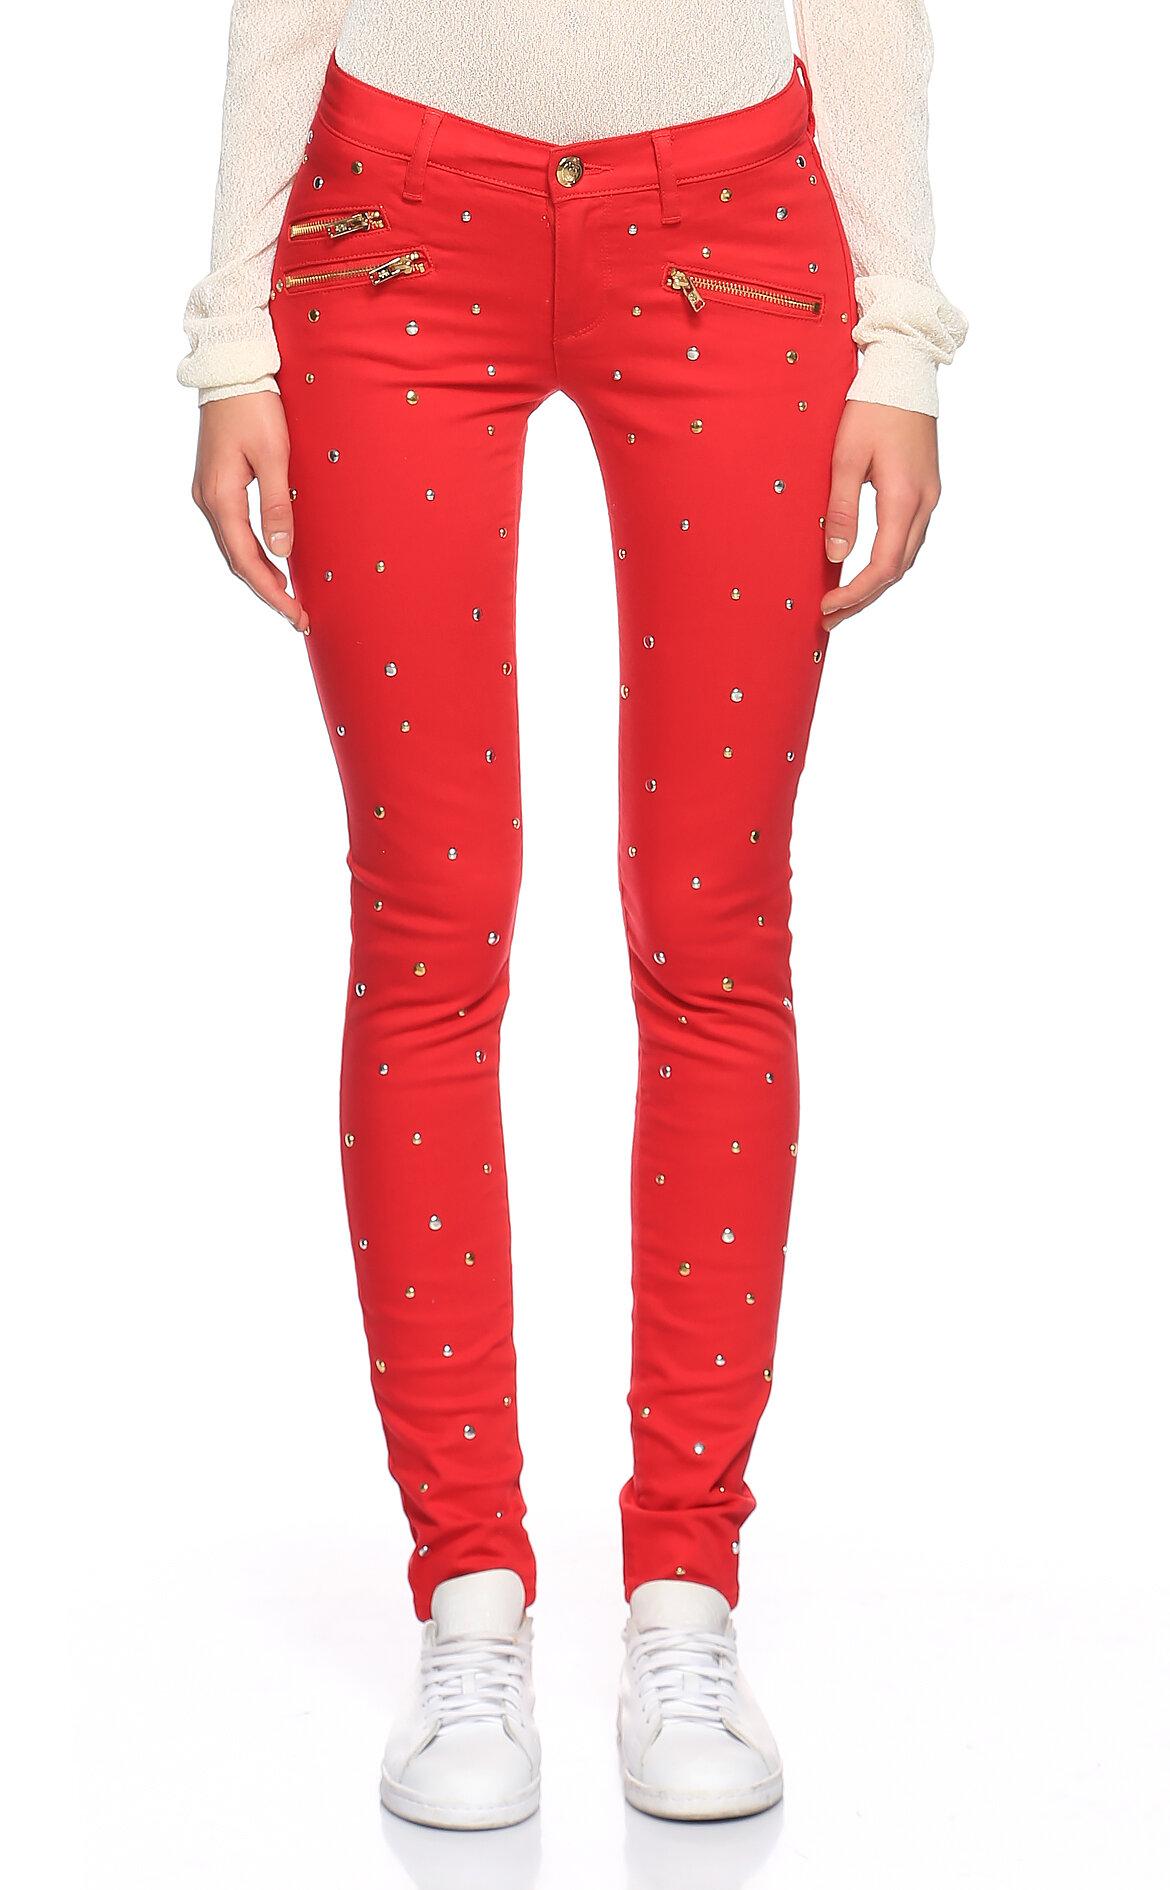 Juicy Couture-Juicy Couture İşleme Detaylı Skinny Kırmızı Jean Pantolon